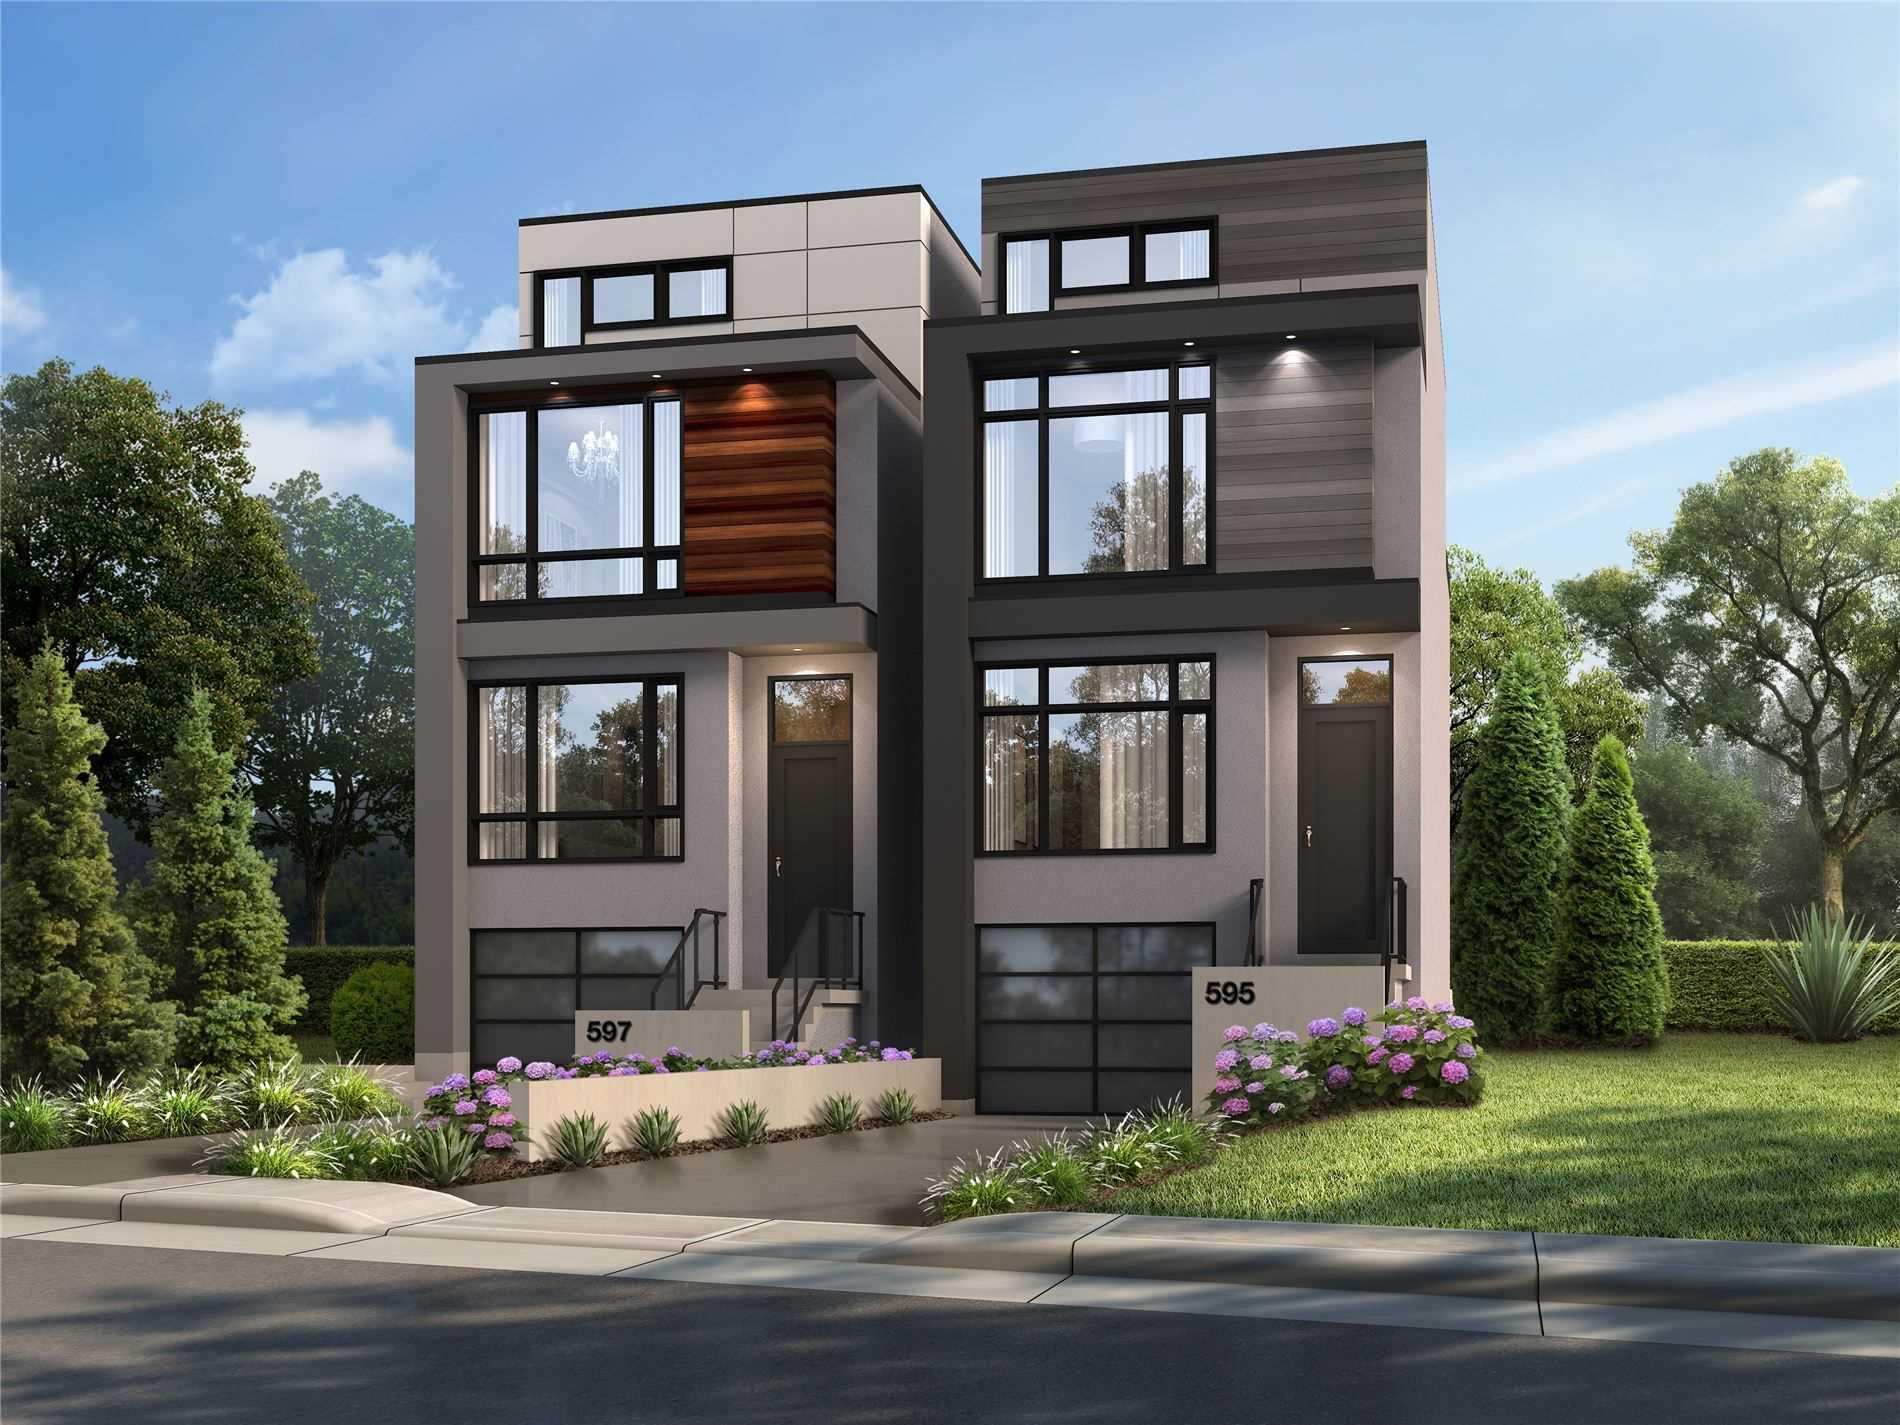 595 Mcroberts Ave, Toronto, Ontario M6E4R5, 4 Bedrooms Bedrooms, 7 Rooms Rooms,5 BathroomsBathrooms,Detached,For Sale,Mcroberts,W5362336